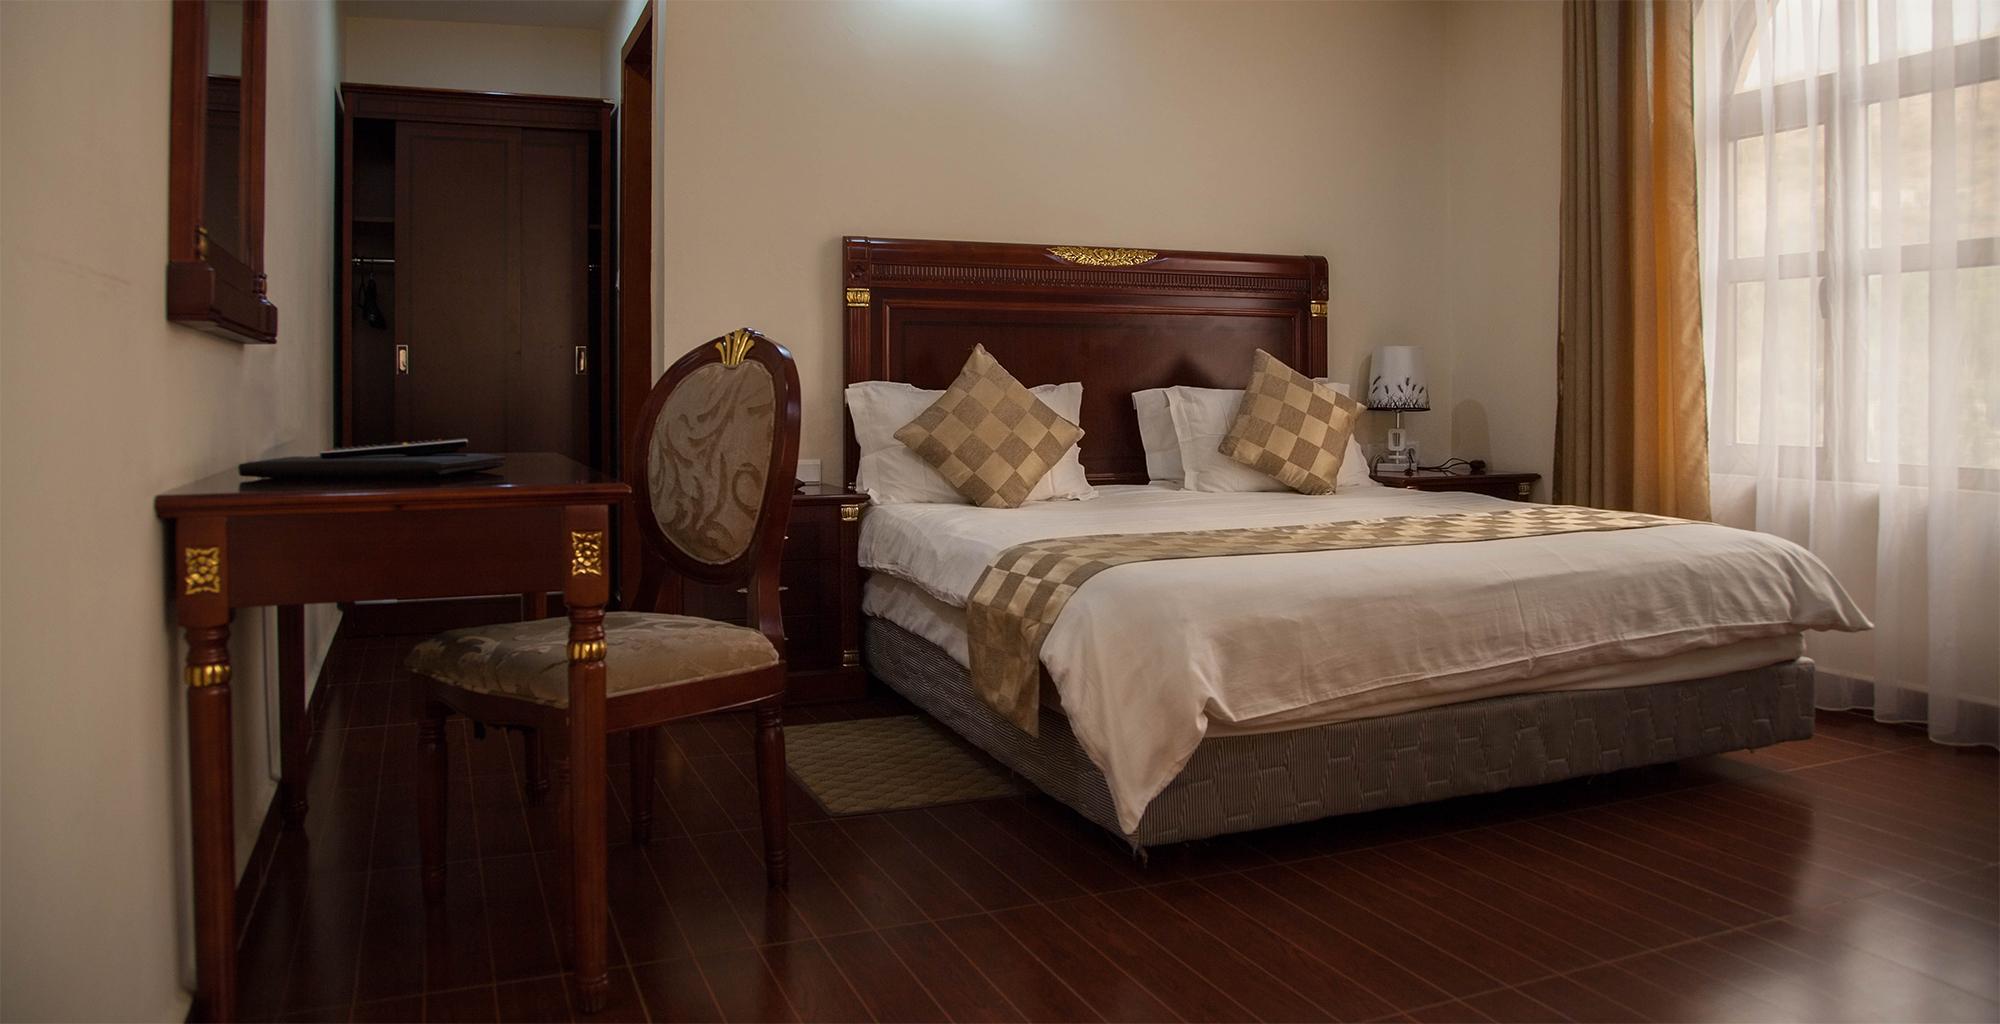 Sabean International Hotel Ethiopia Bedroom